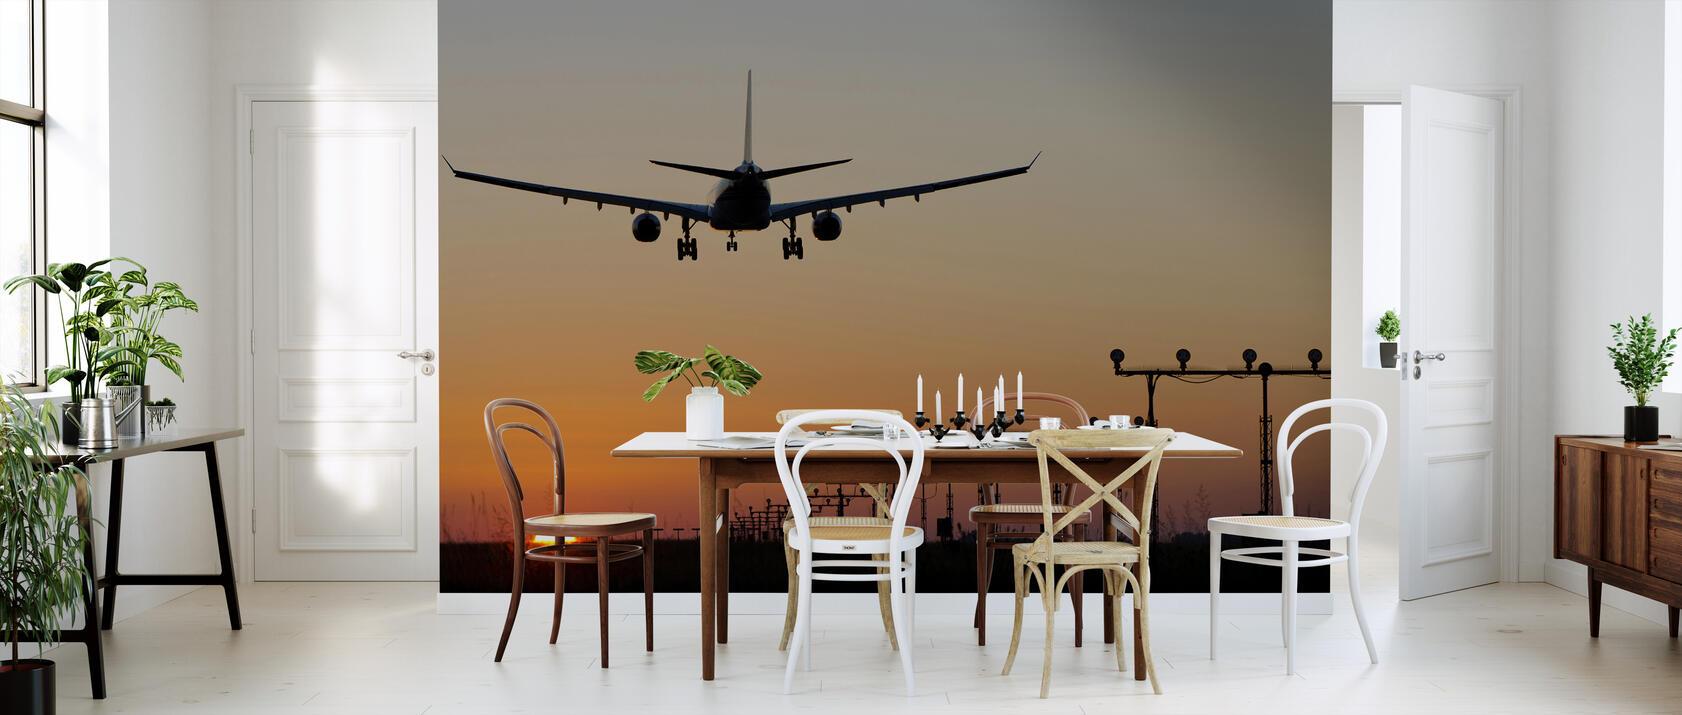 sunset landing mit fototapeten einrichten photowall. Black Bedroom Furniture Sets. Home Design Ideas